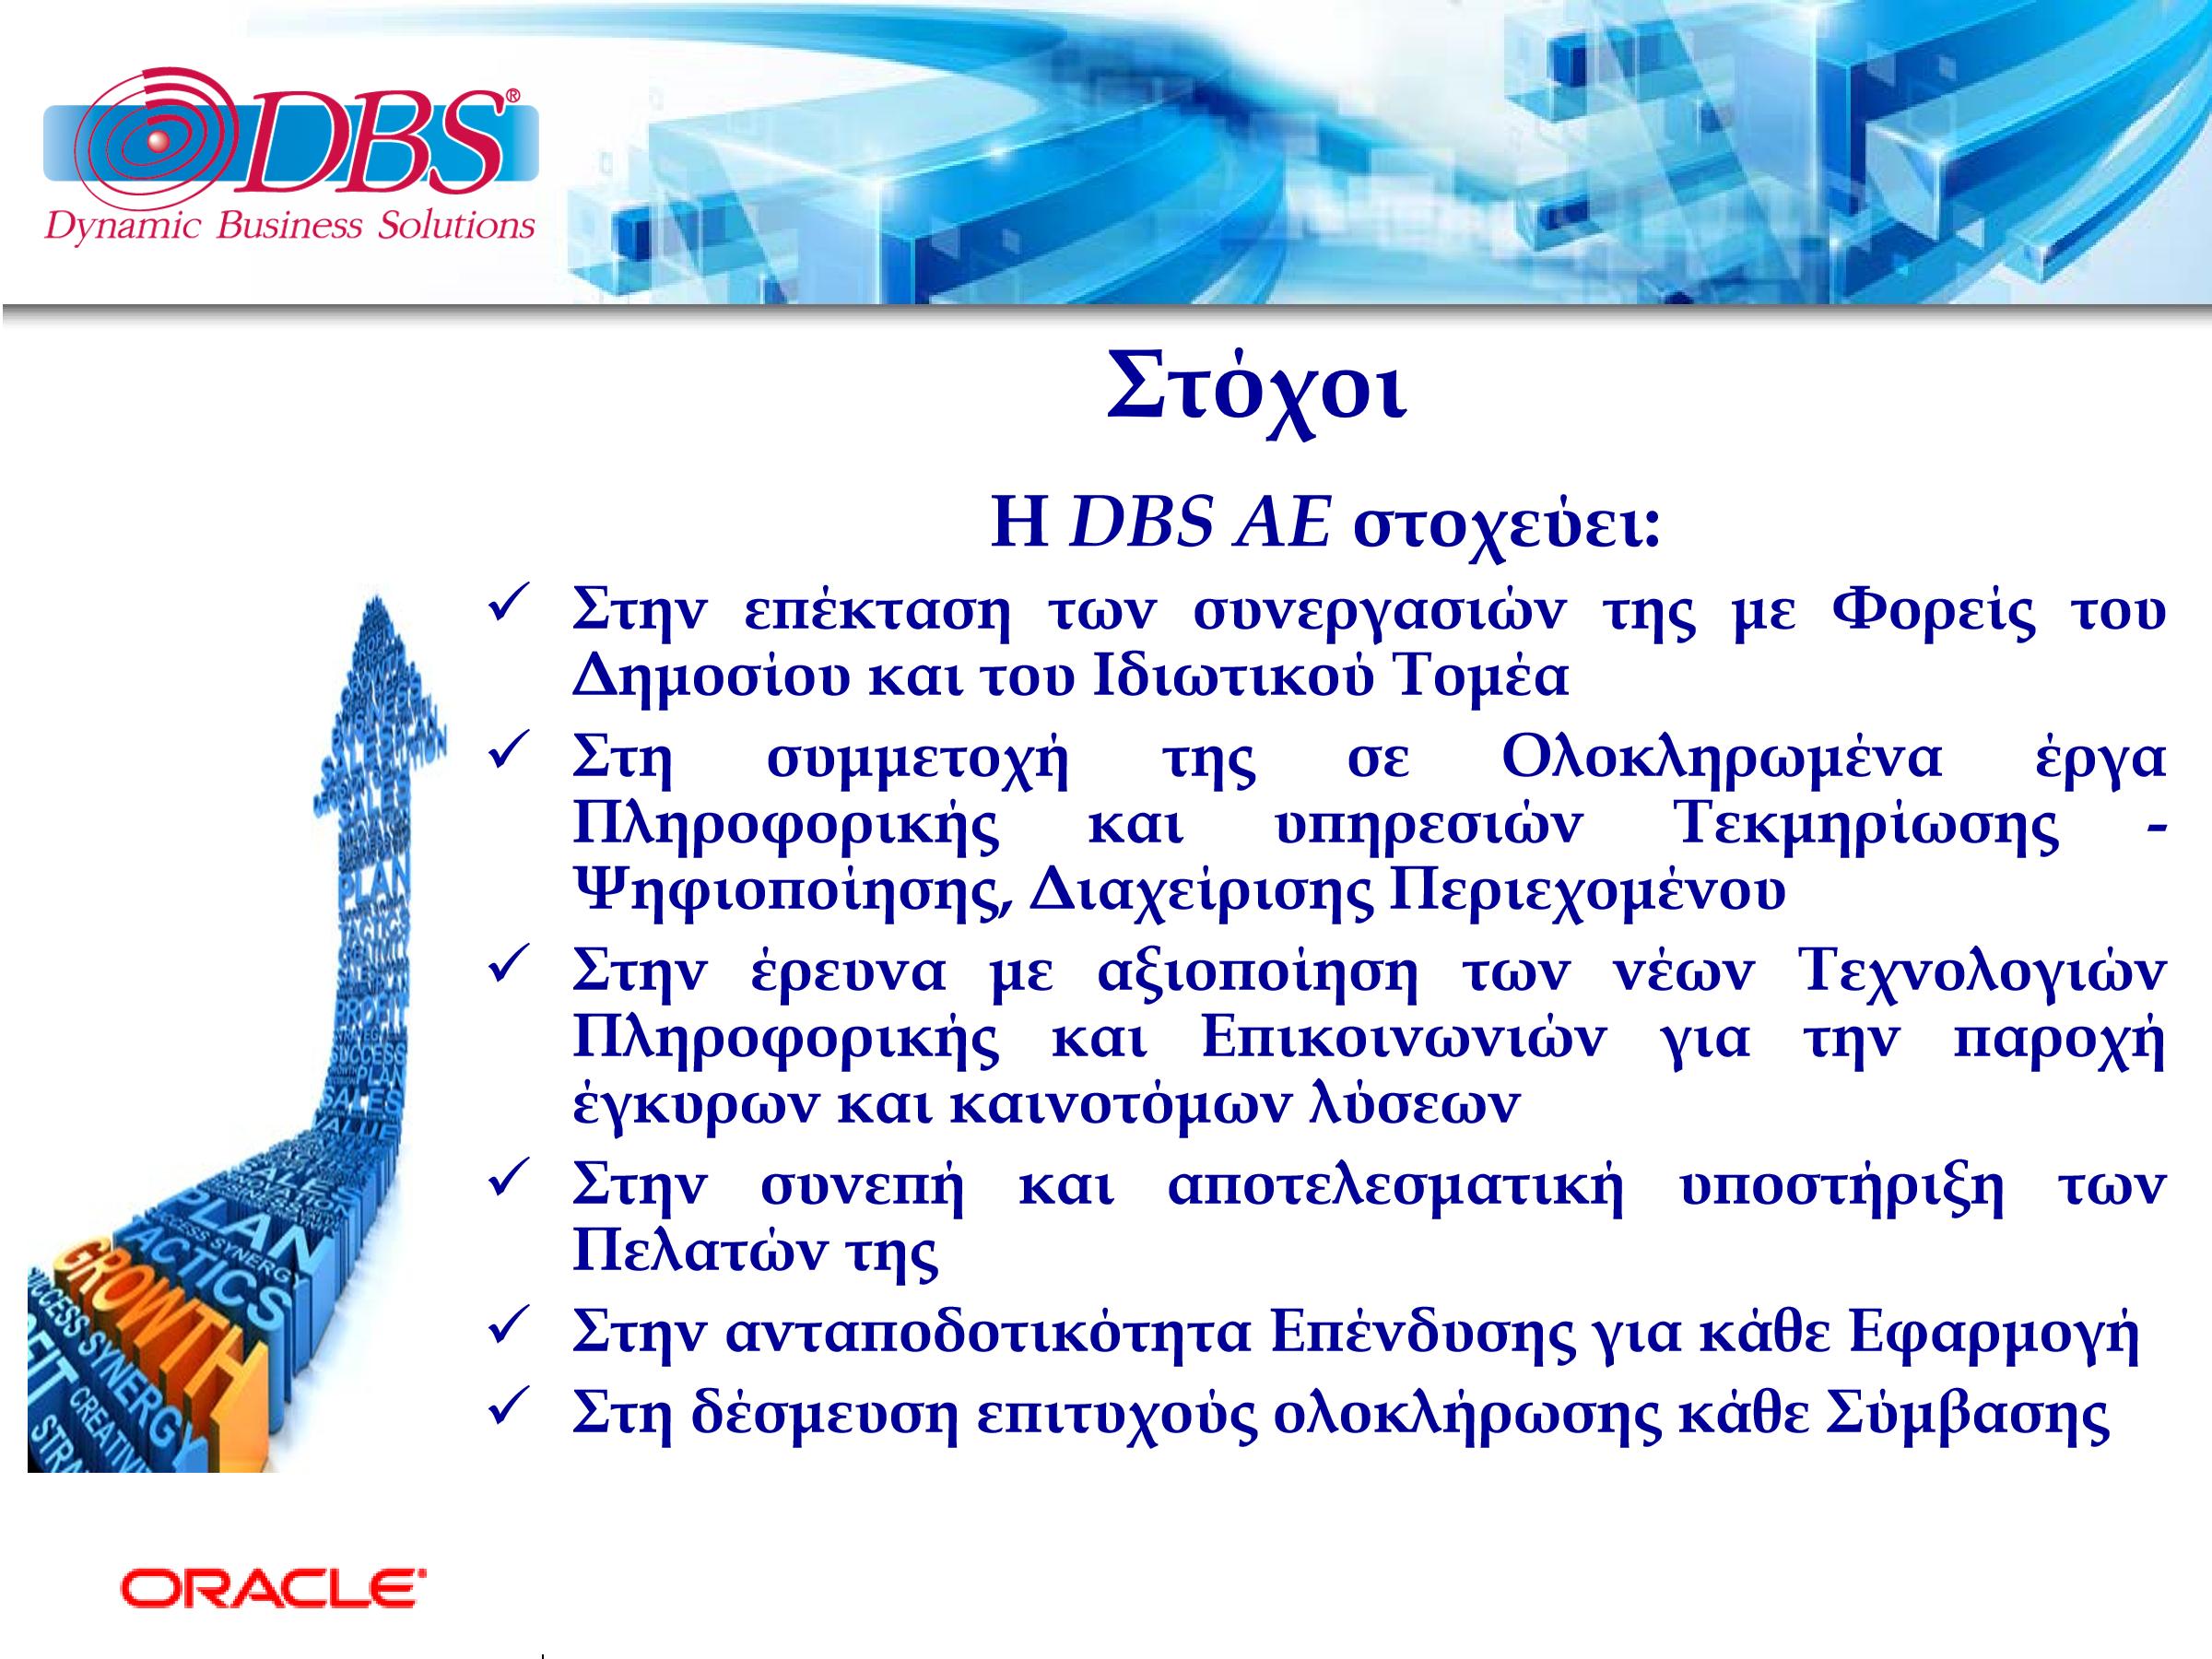 DBSDEMO2019_COMPANY_PROFILE_V18_R26FB-EL-5